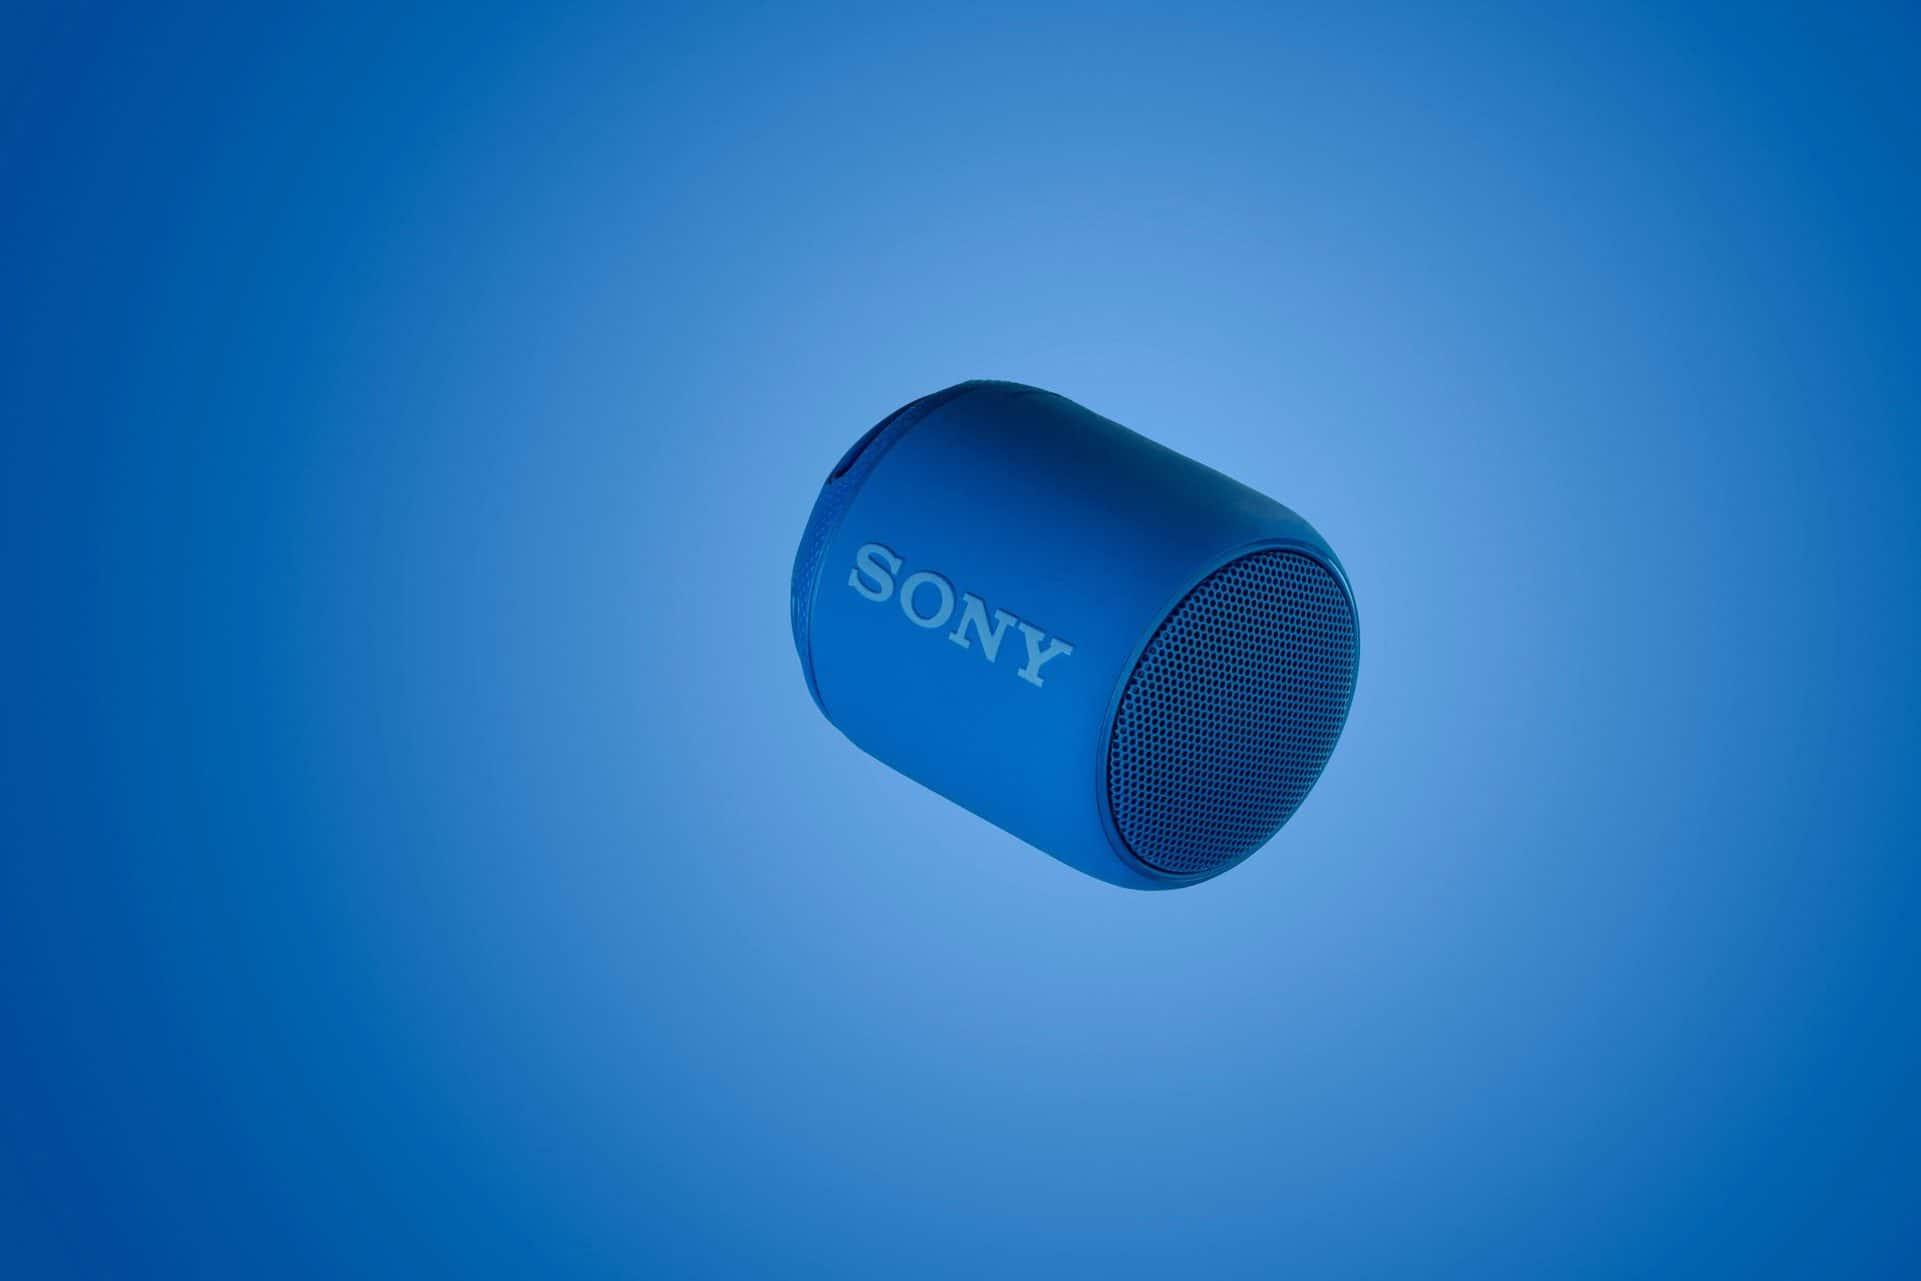 Sony SRS-XB10 Produkt Fotografie